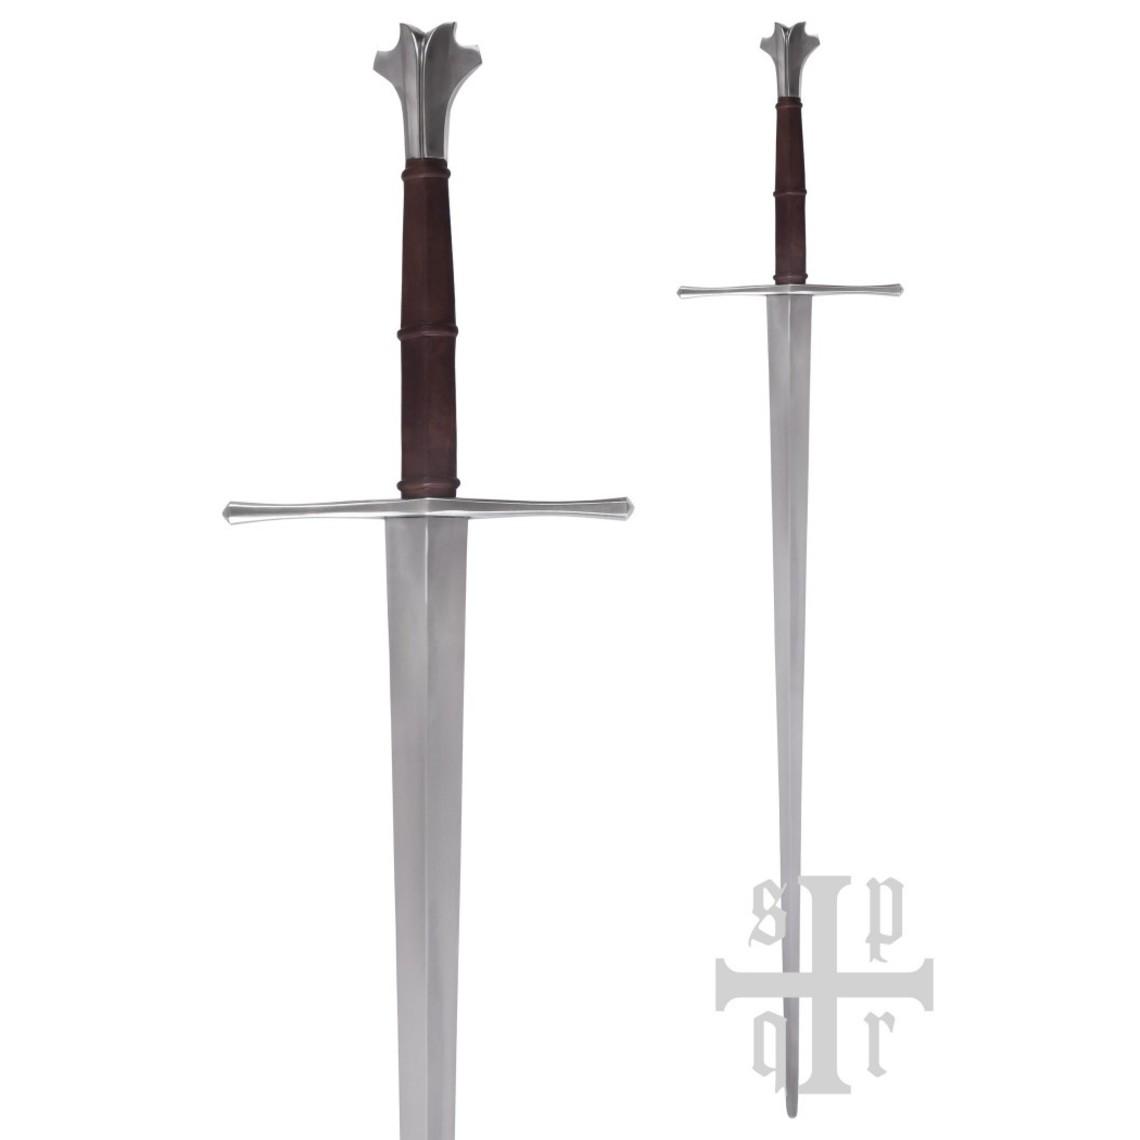 SPQR Espada de dos manos 1450-1460 Zurich, lista para la batalla